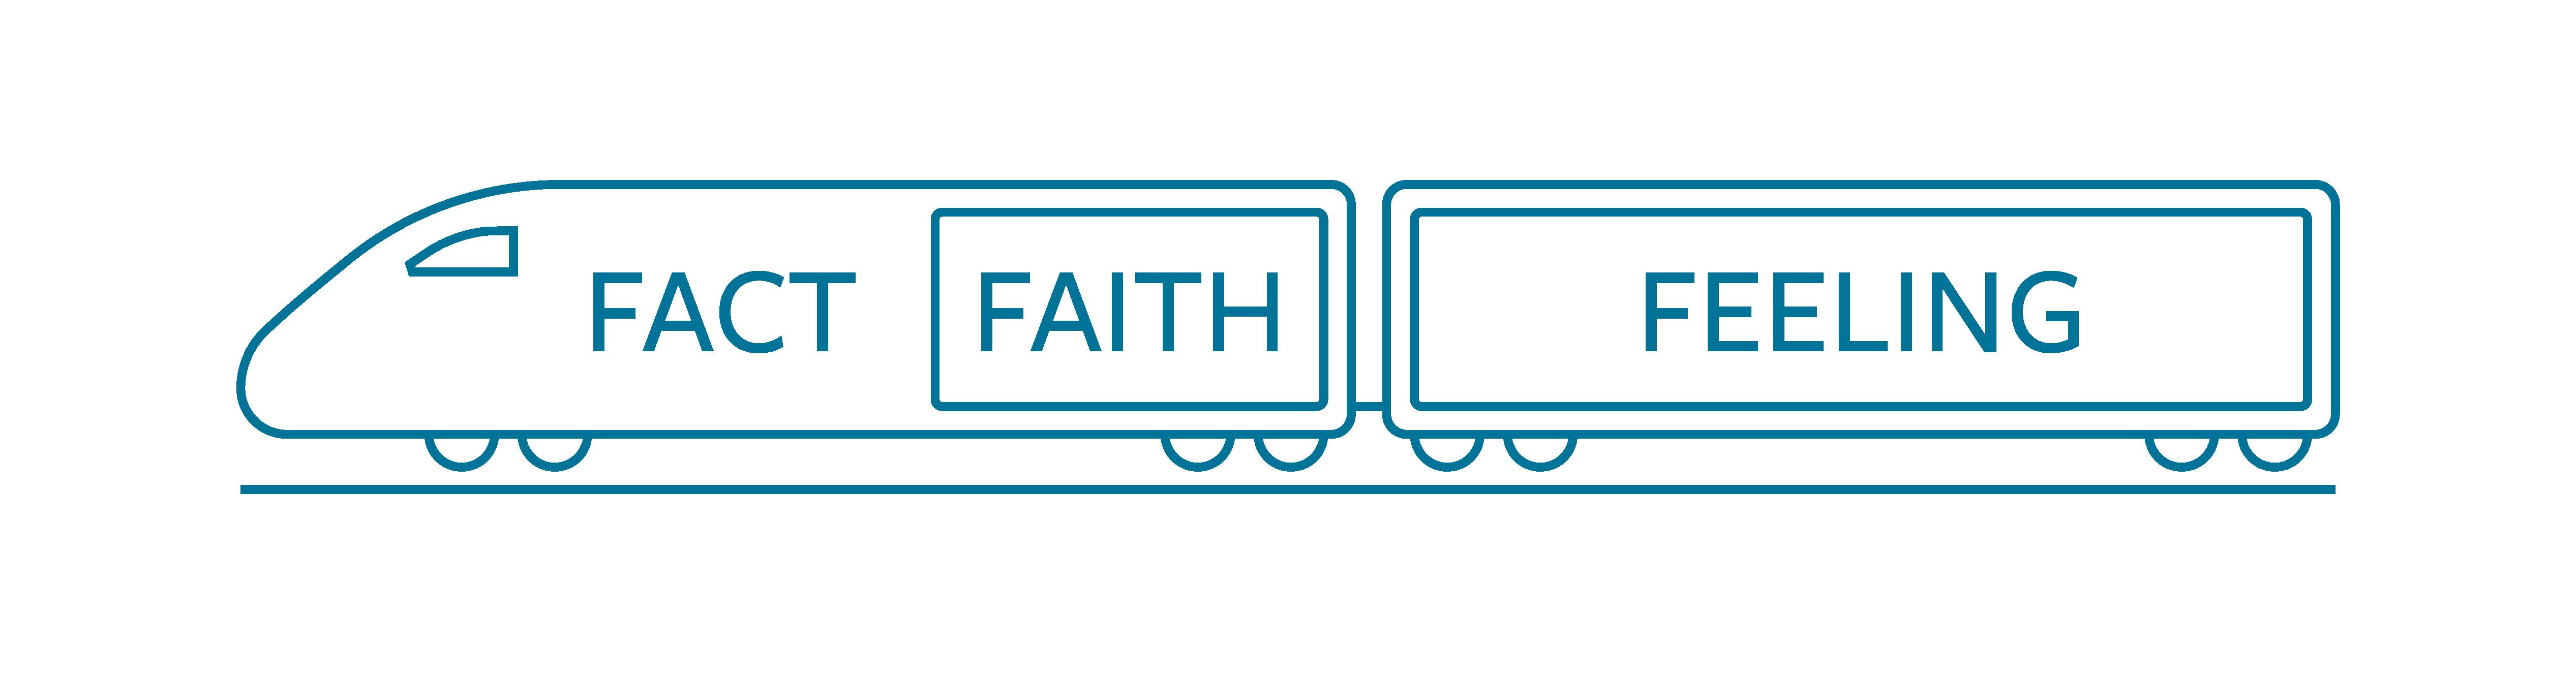 Have you made the. Faith clipart spiritual development